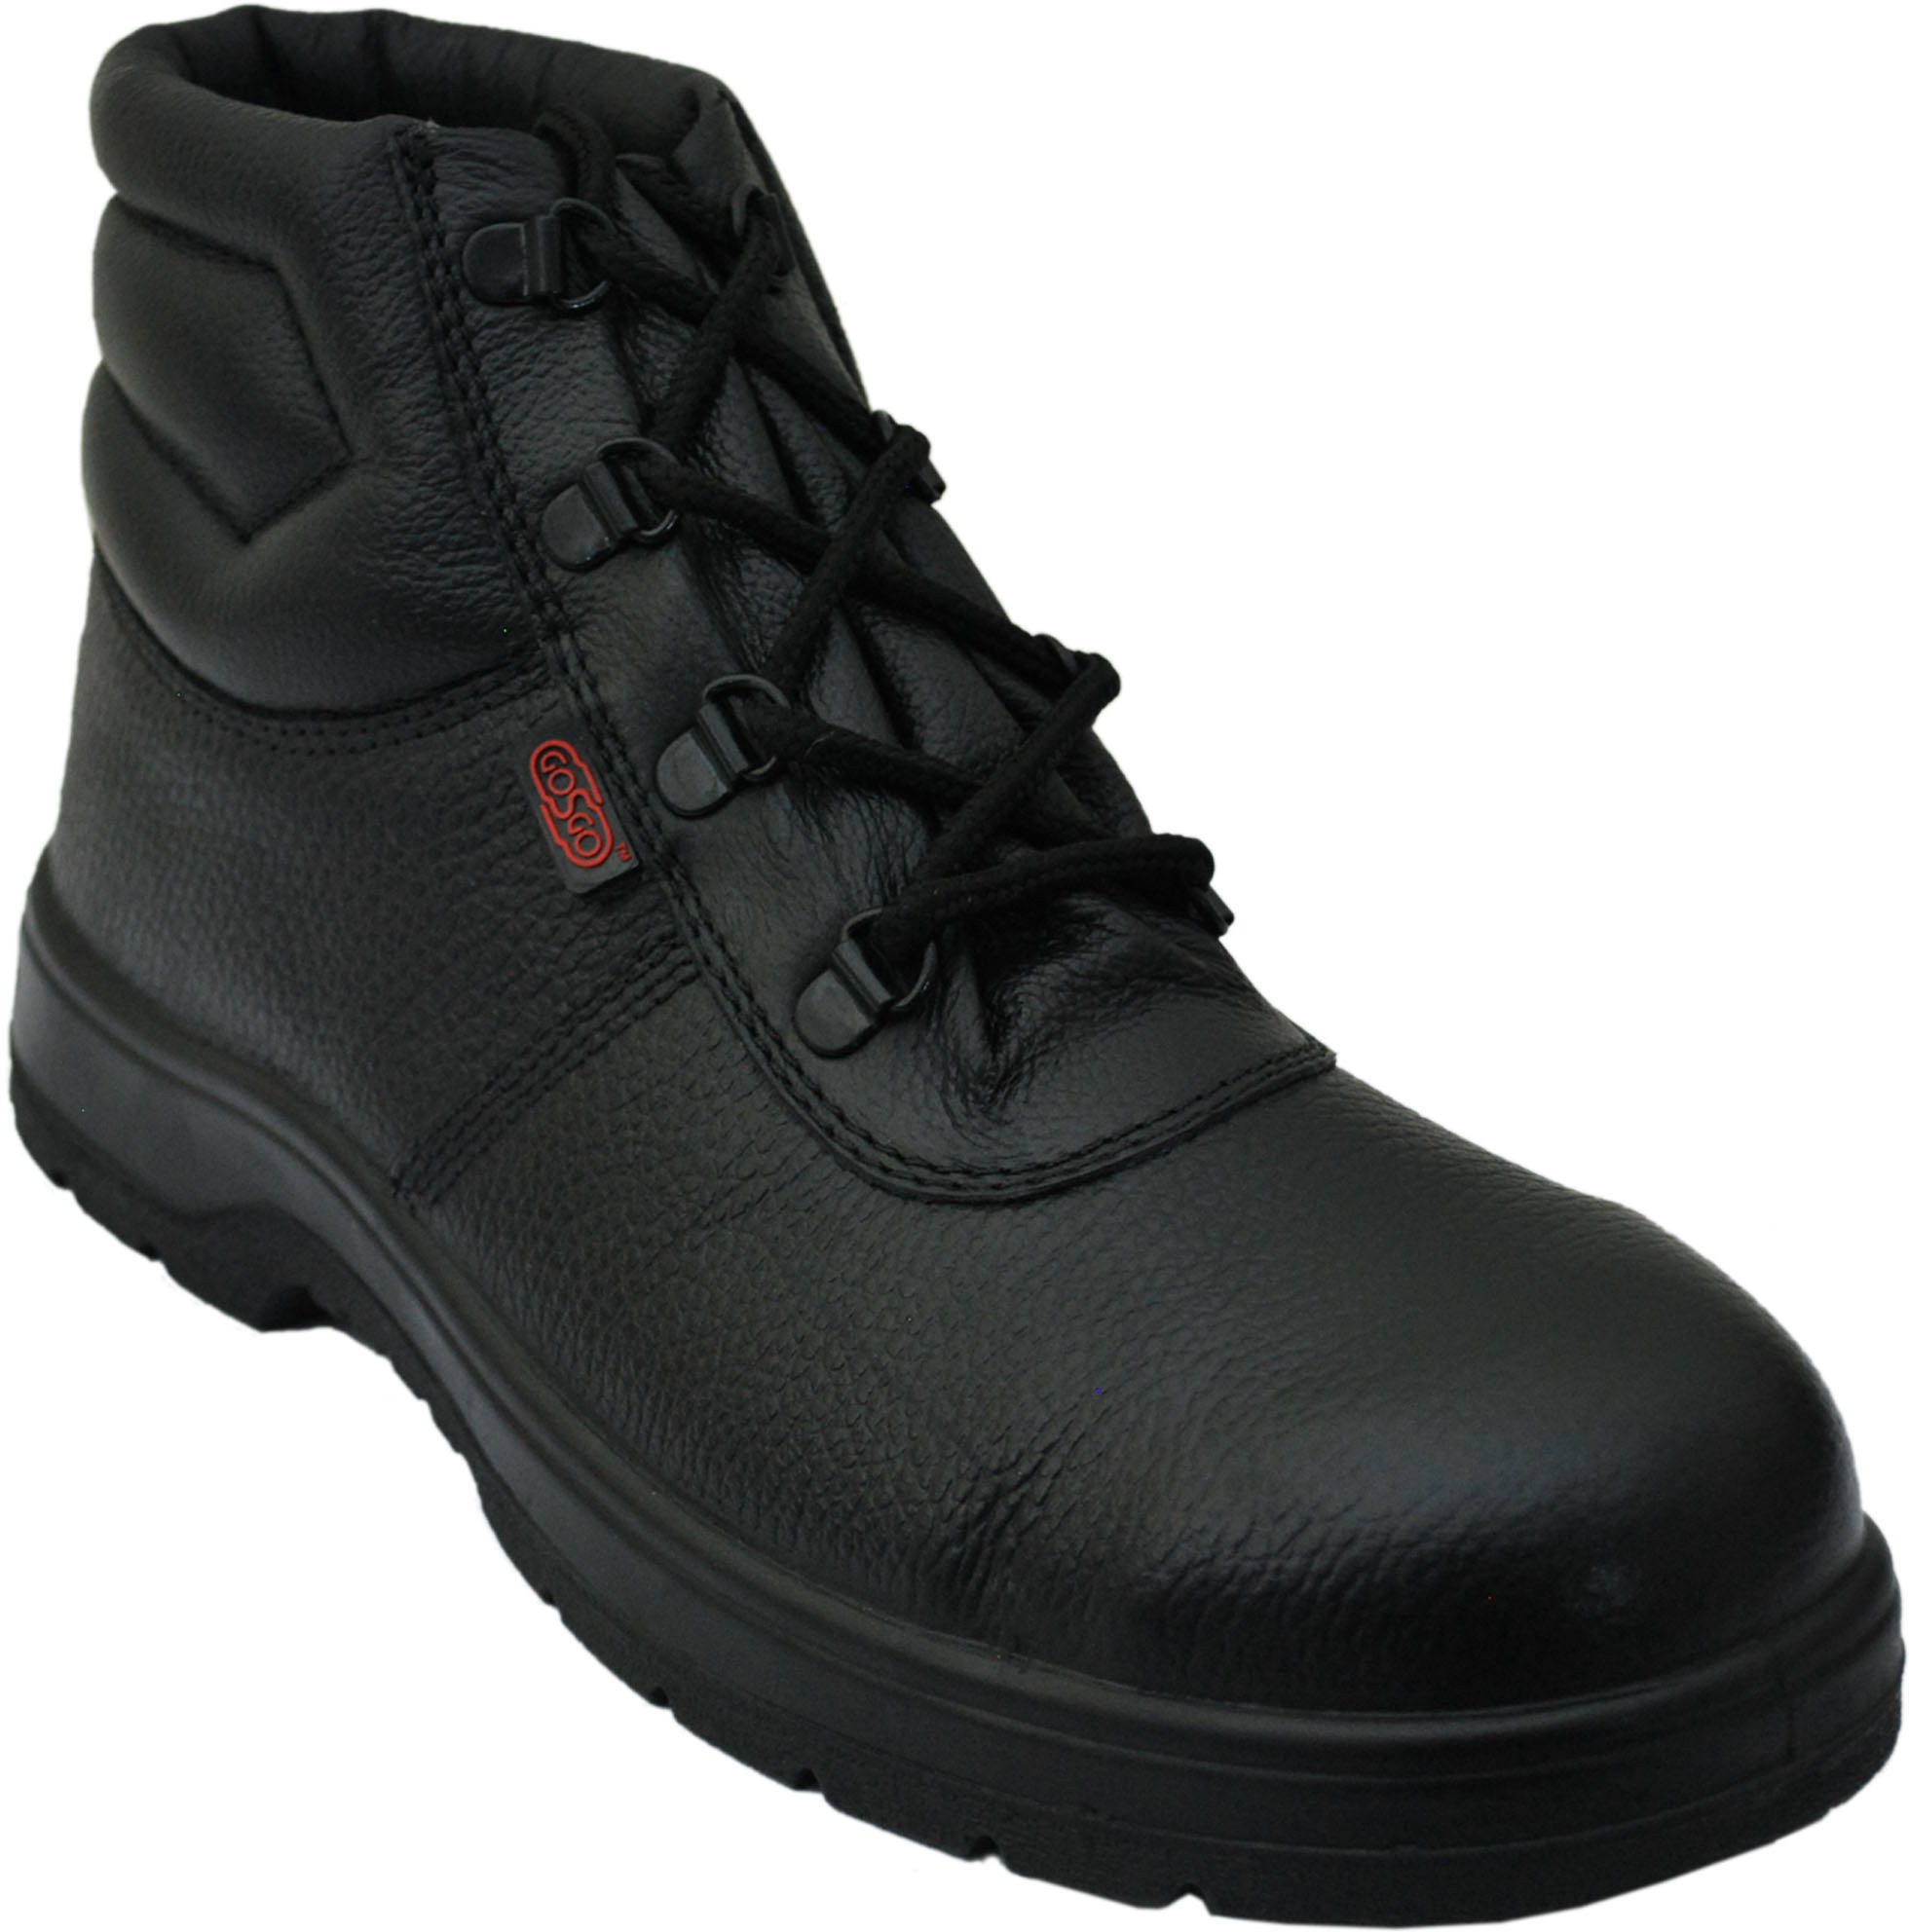 b0bfd64c63b Buy Gosgo SS-16 Boots Shoes on Flipkart